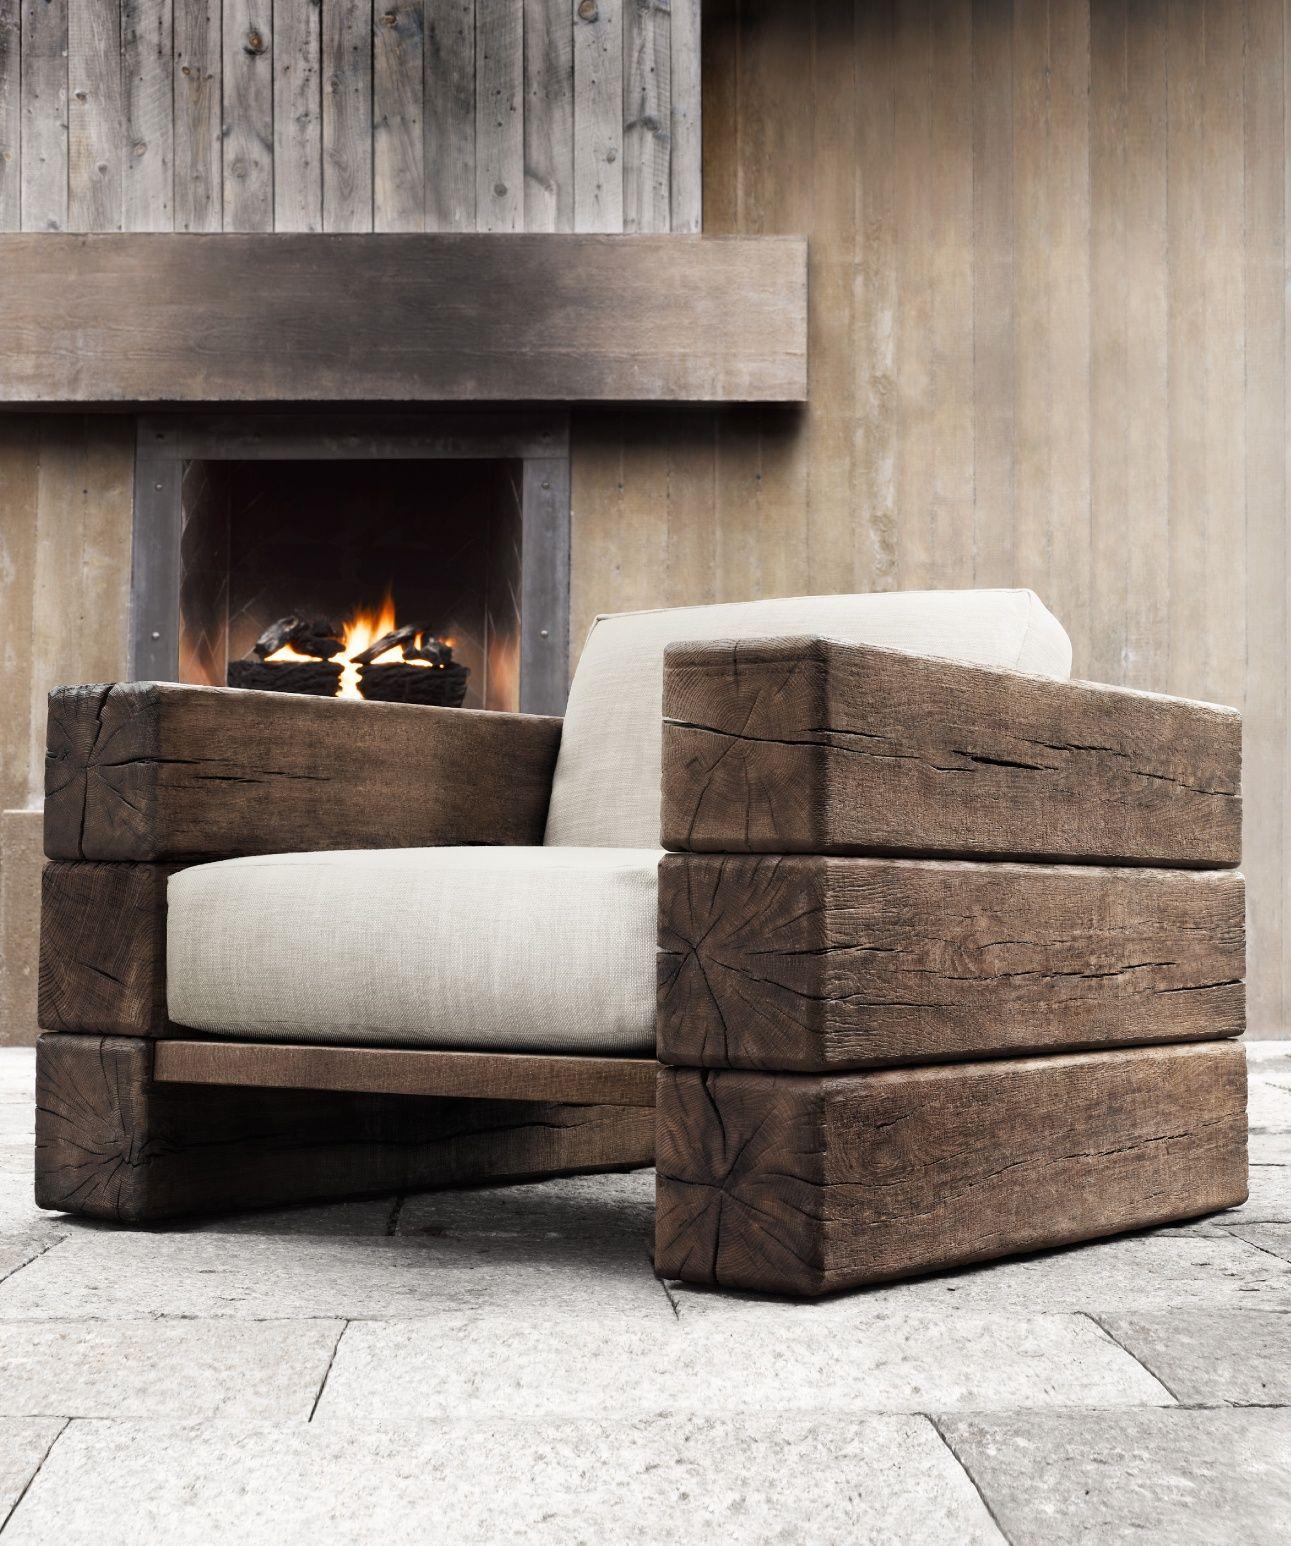 rh source books outdoor couch pinterest m bel stuhl und holz. Black Bedroom Furniture Sets. Home Design Ideas